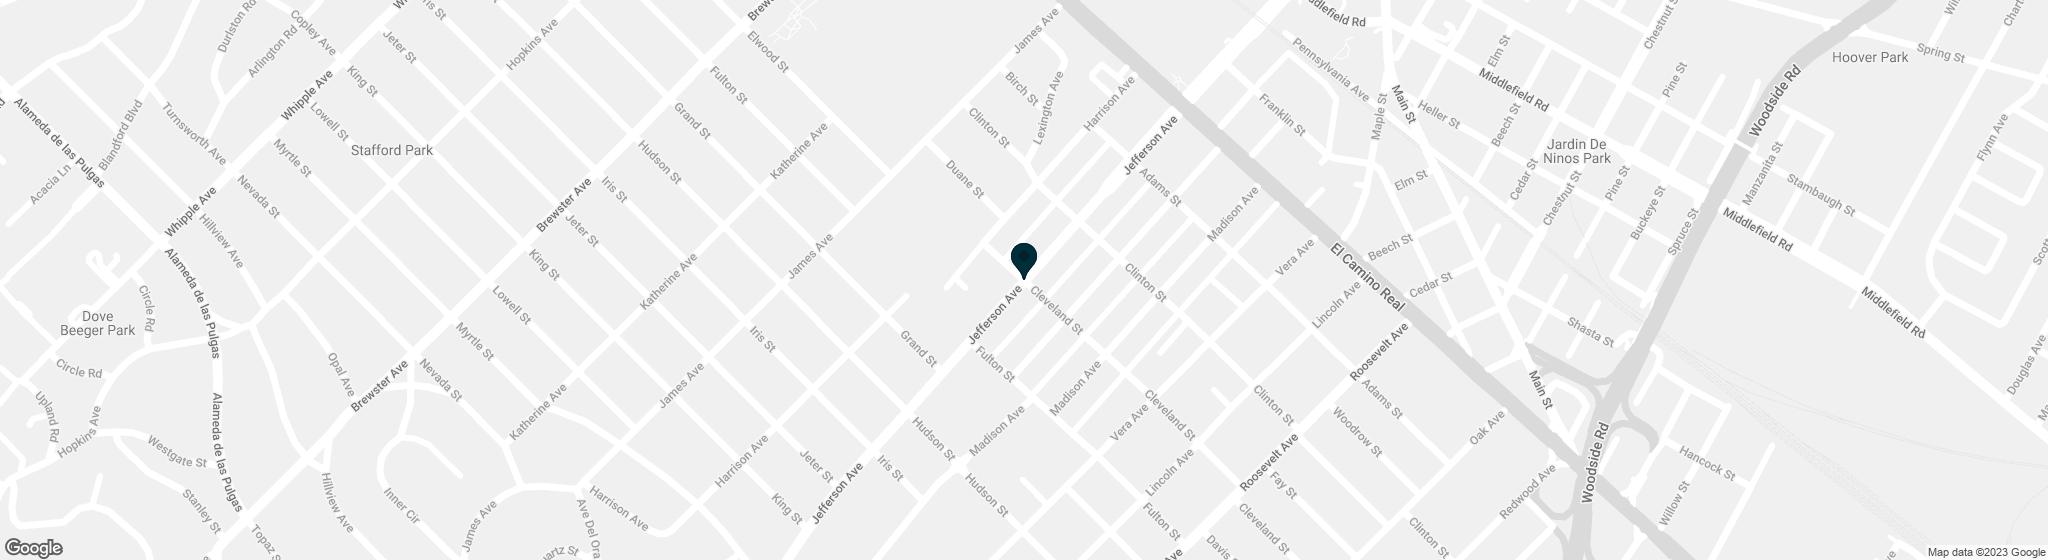 501 Cleveland St. Redwood City CA 94062